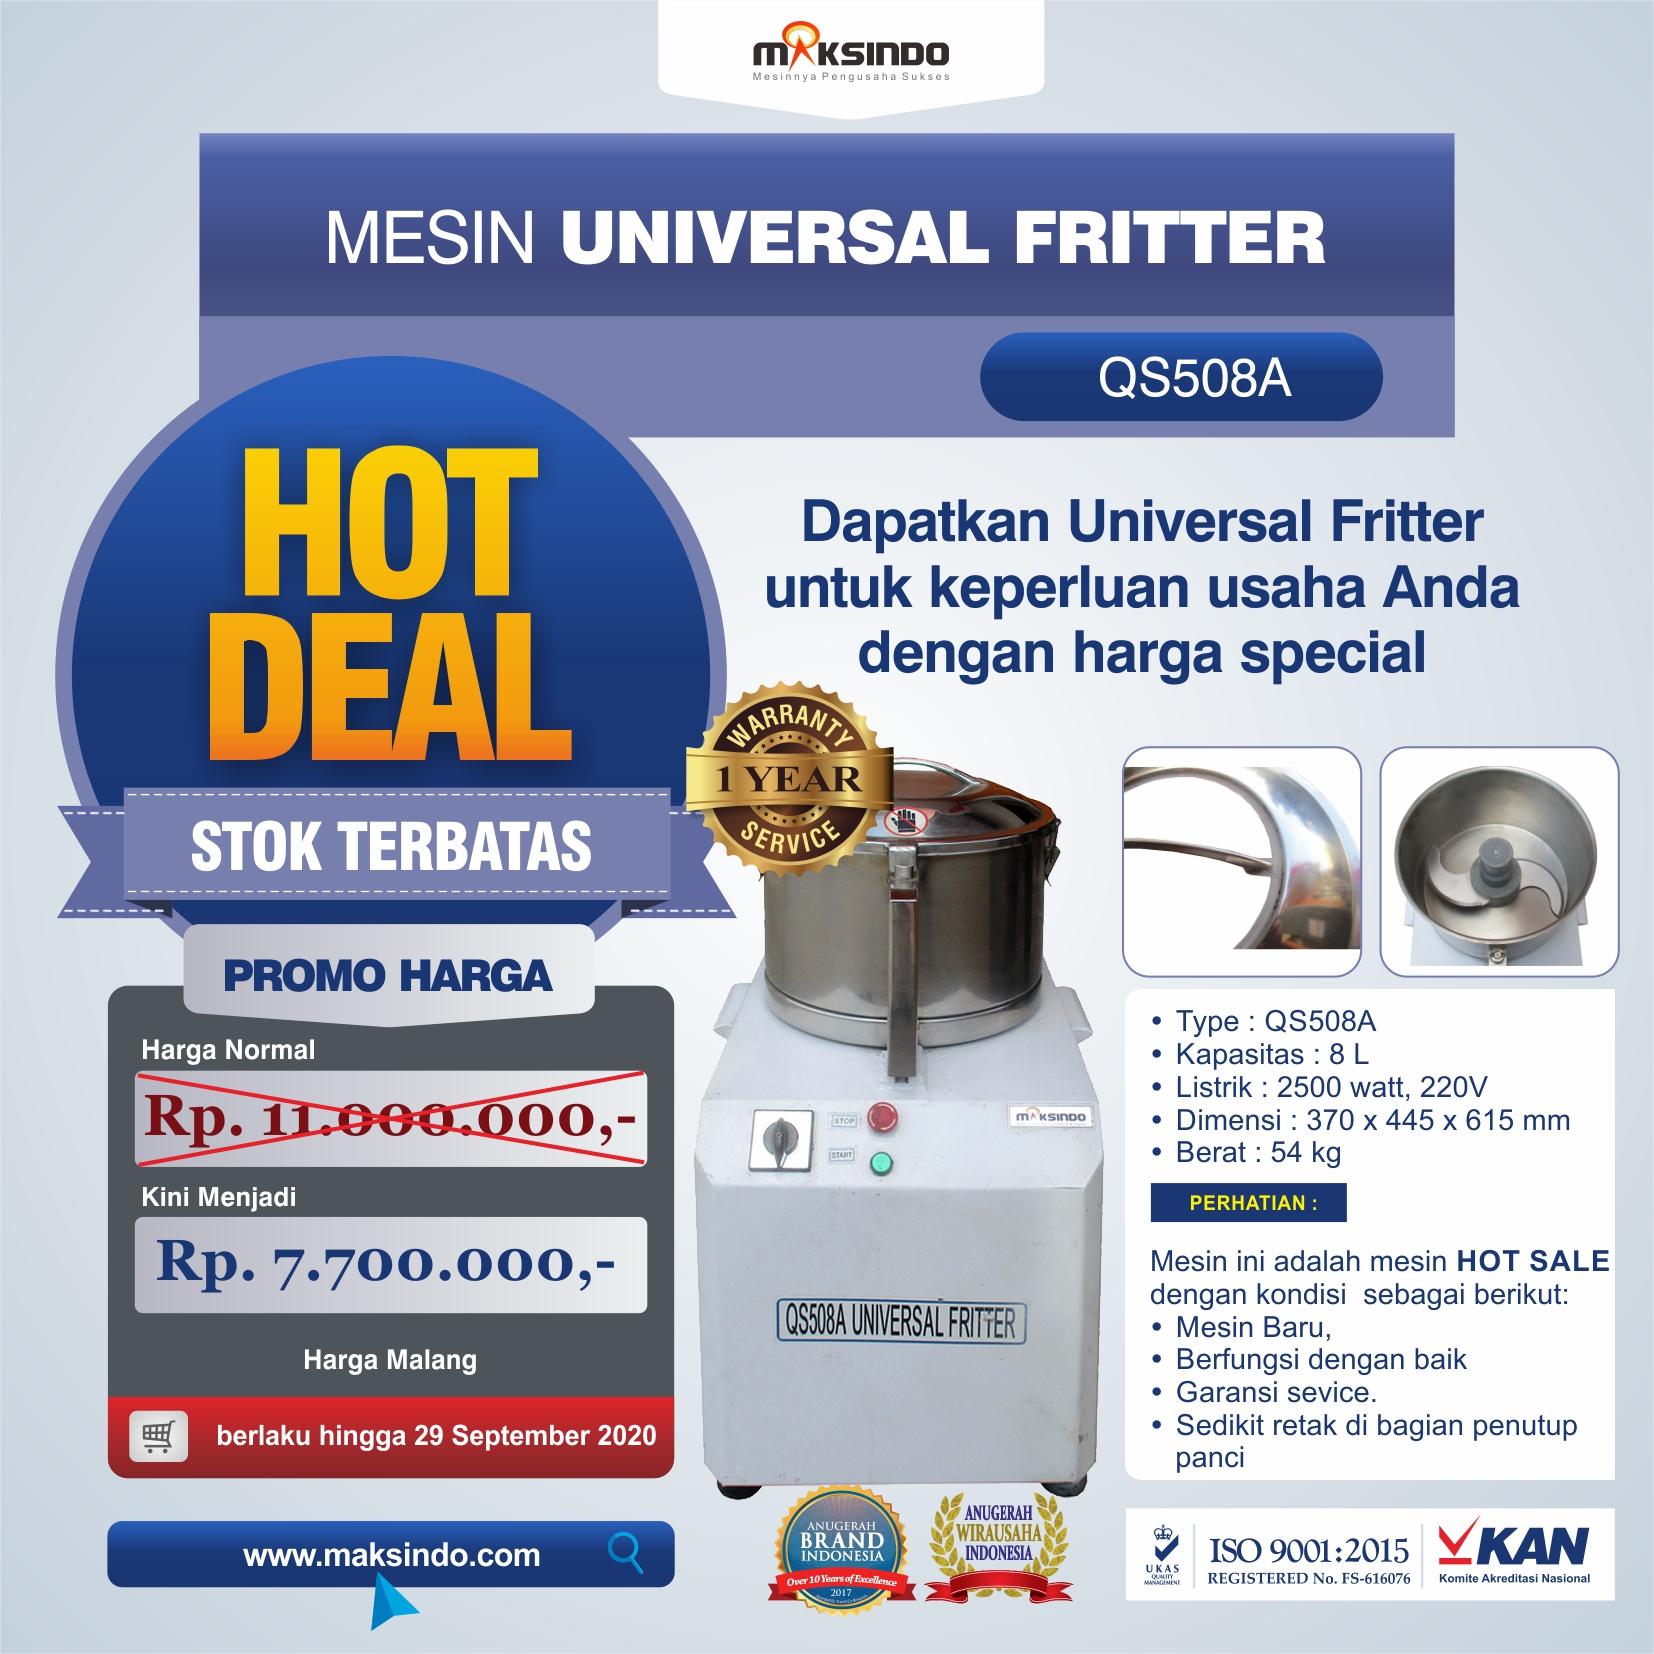 Jual Mesin Universal Fritter QS508A di Blitar